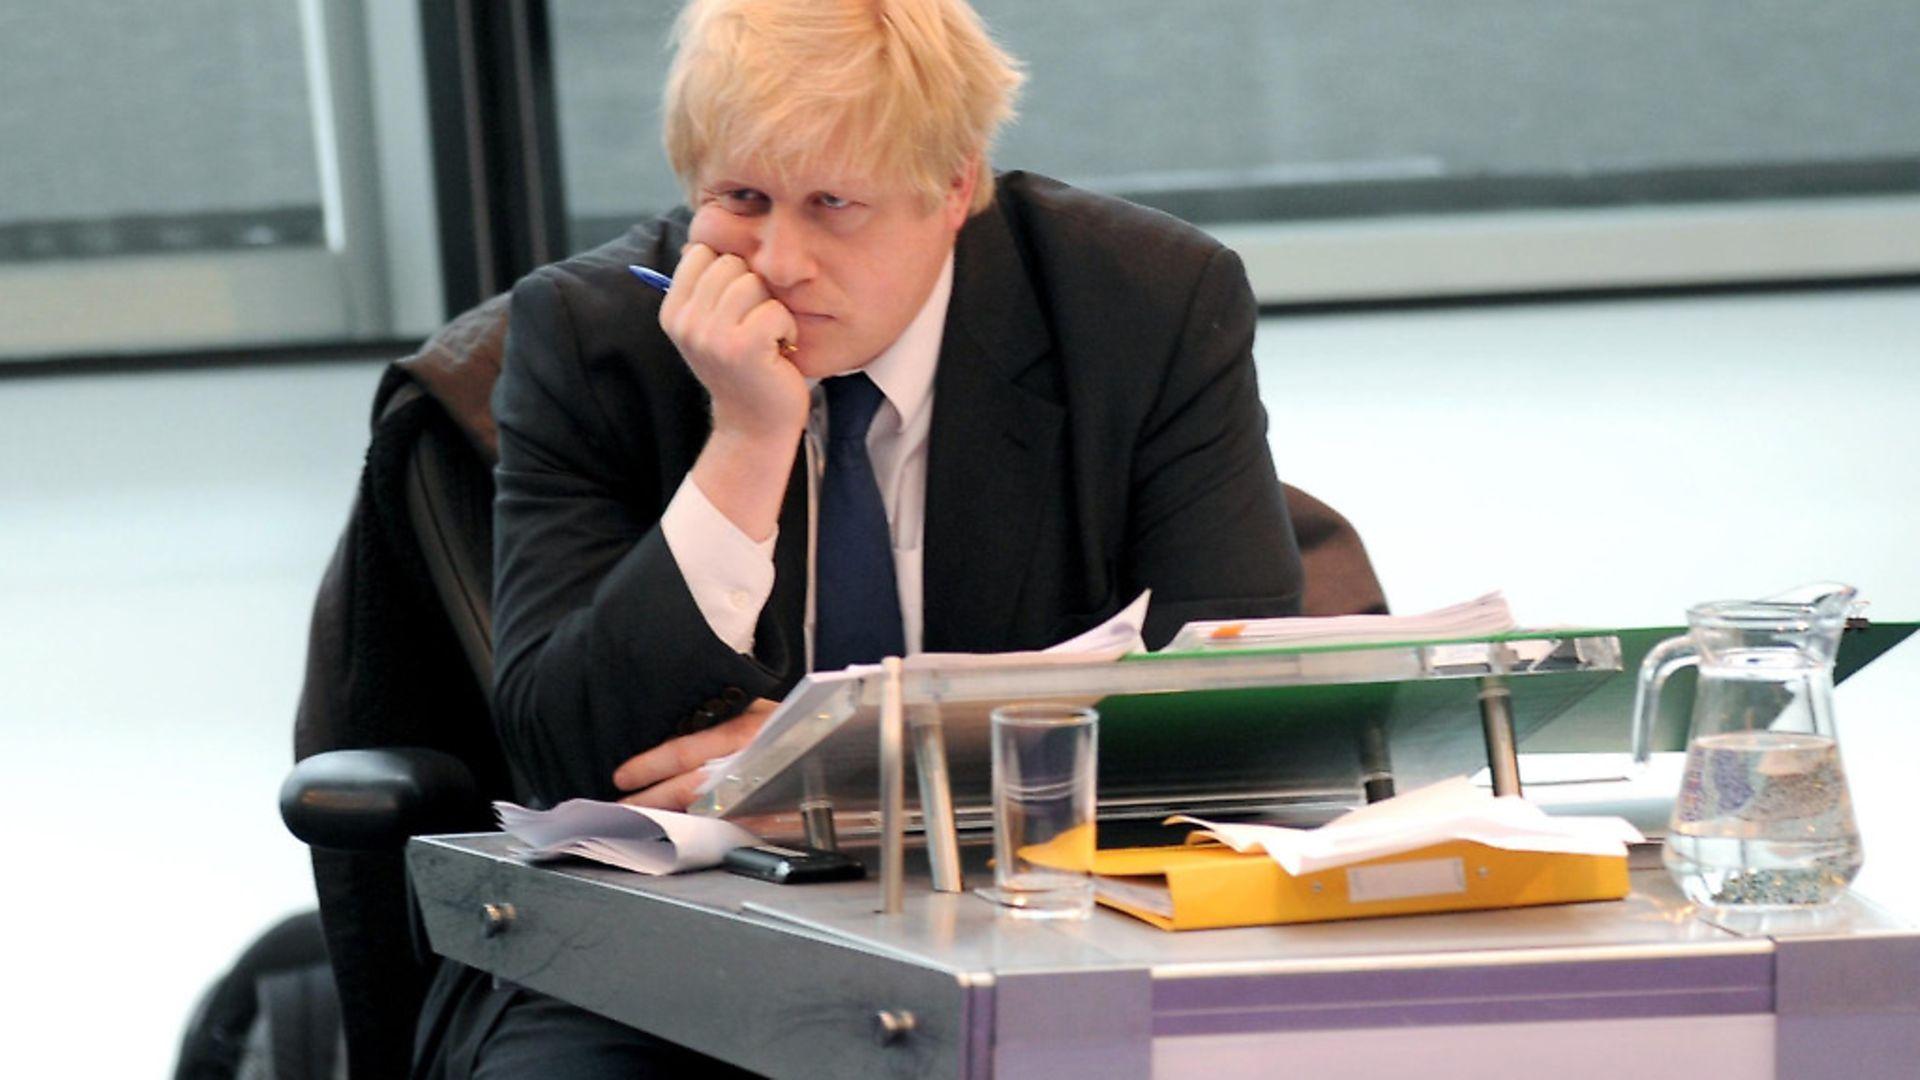 Boris Johnson. Photograph: Anthony Devlin/PA Images. - Credit: PA Archive/PA Images